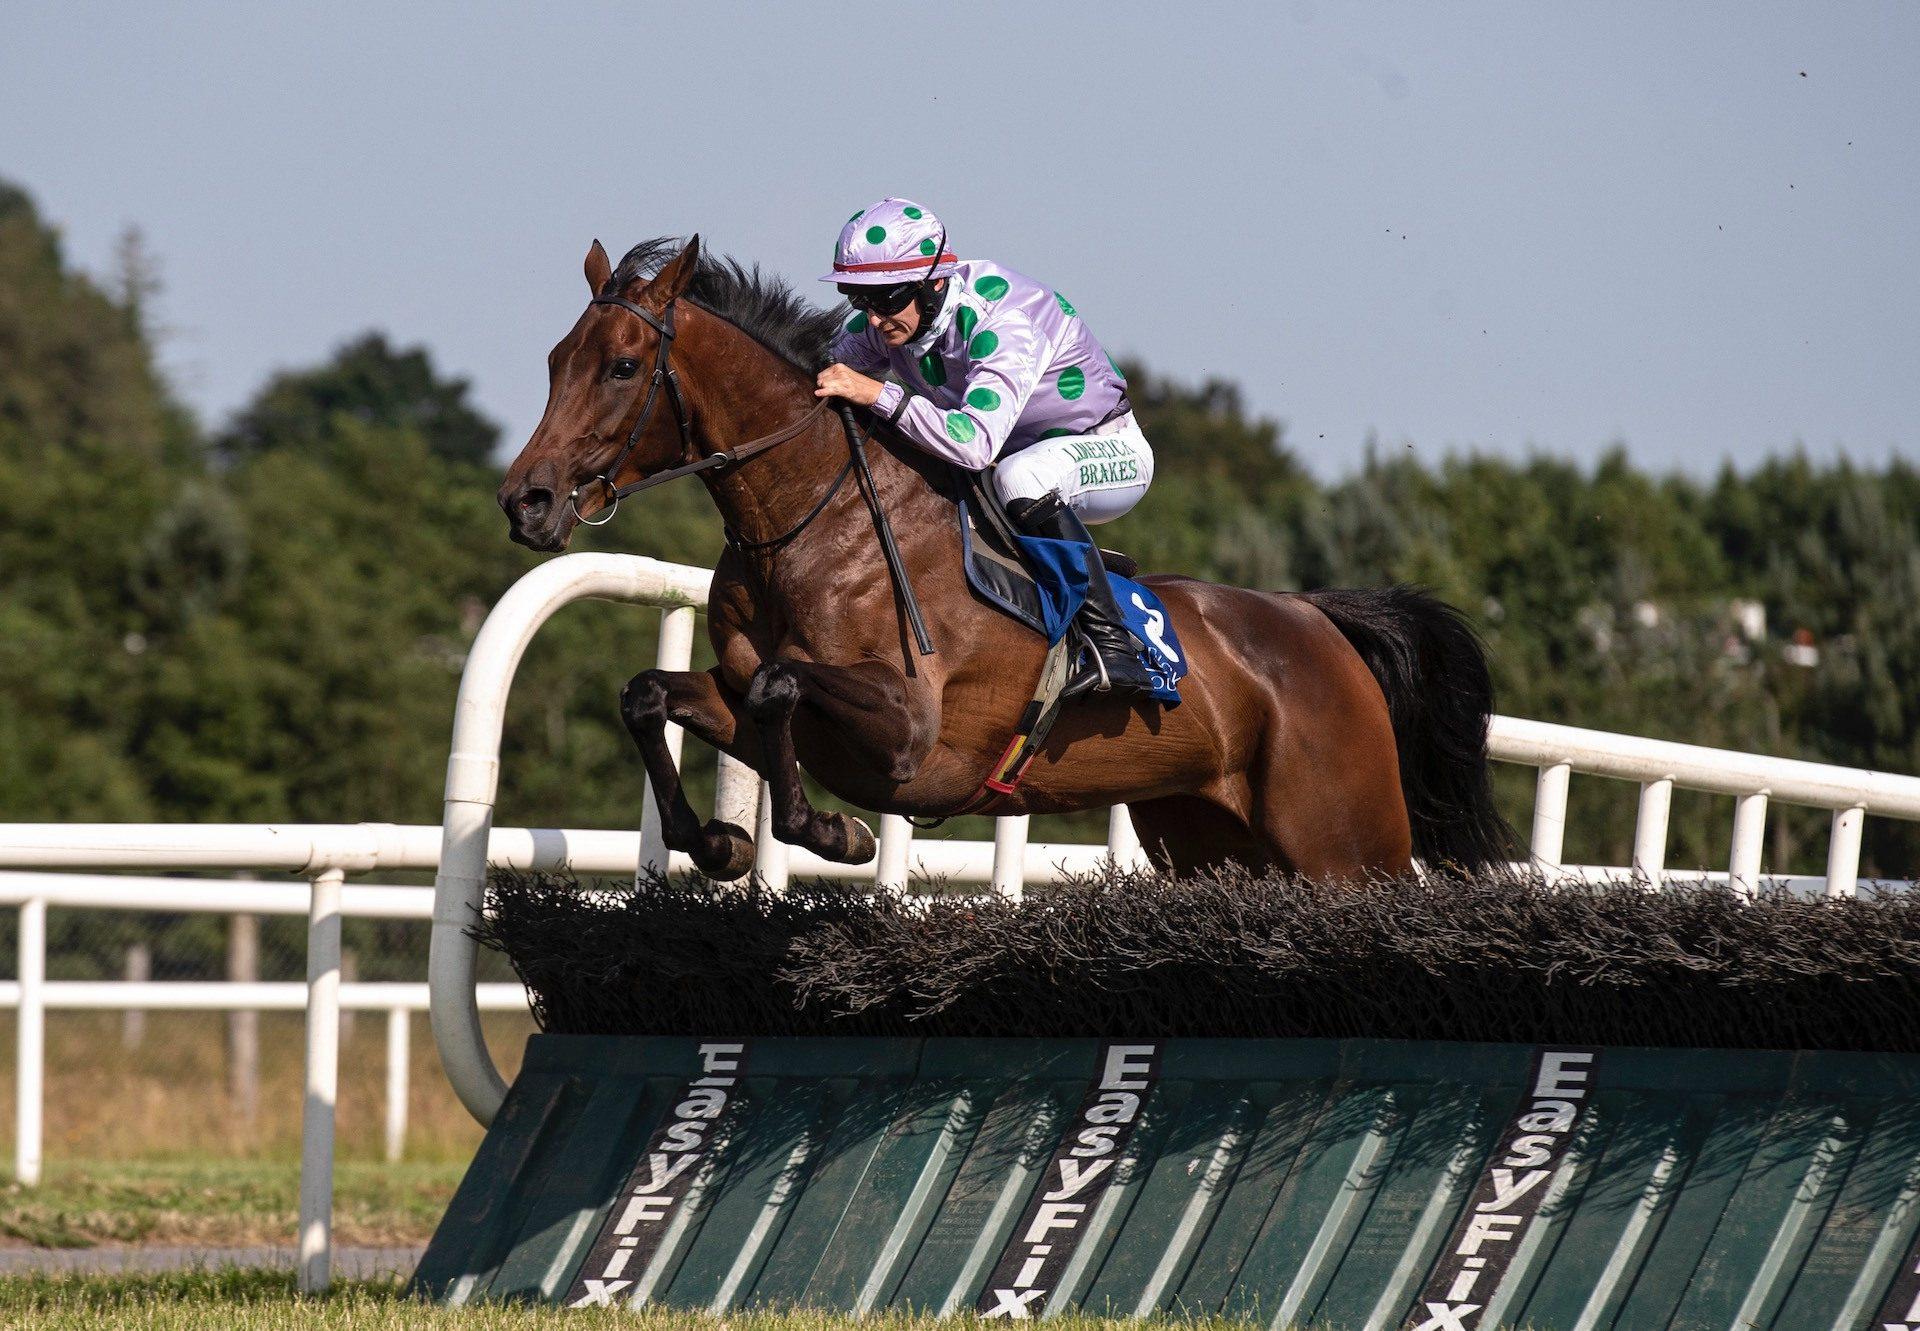 Whosgotyanow (Getaway) Wins The Mares Rated Novice Hurdle At Limerick